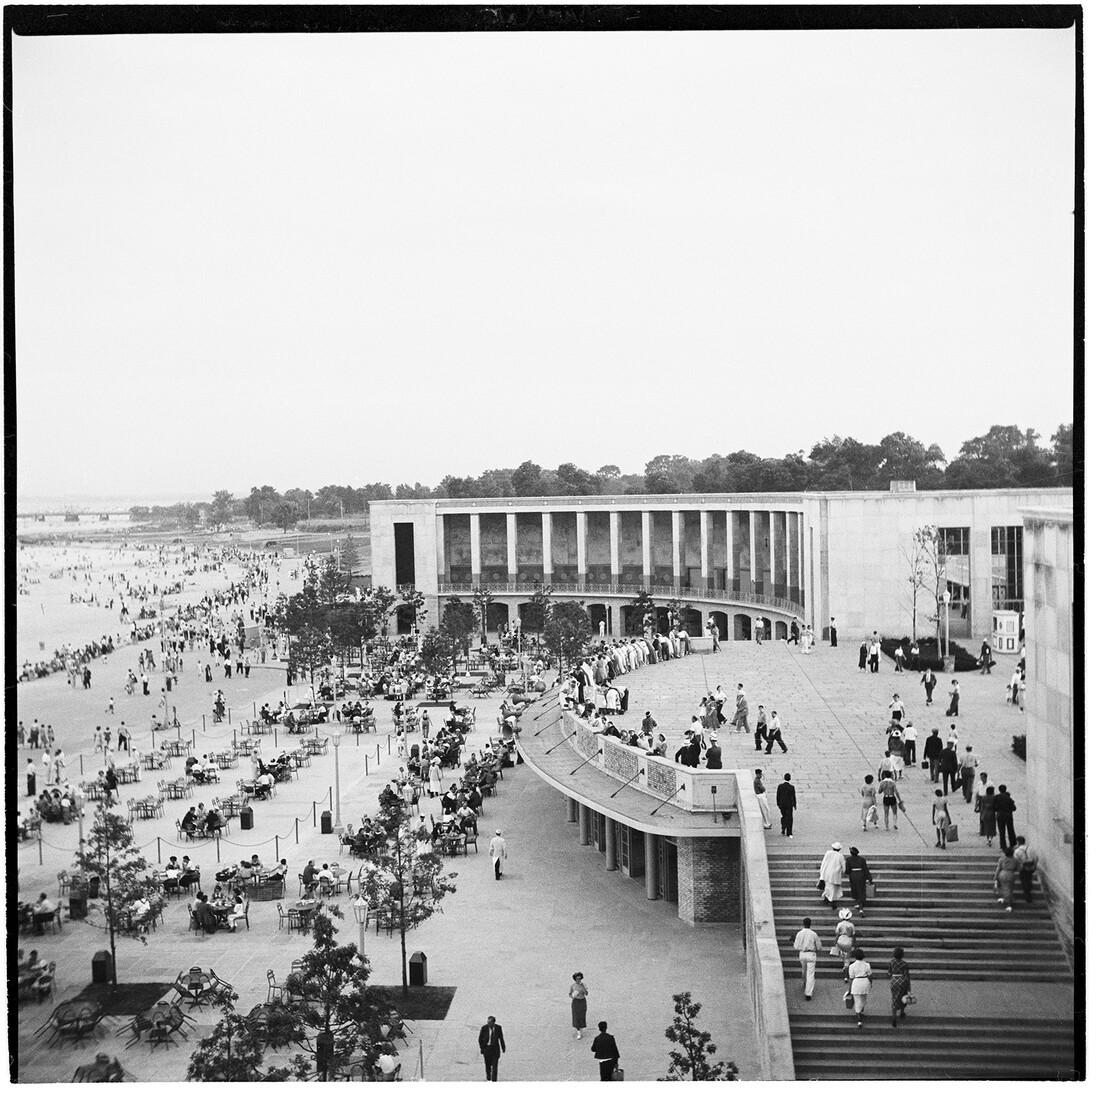 12206_7-18-1937